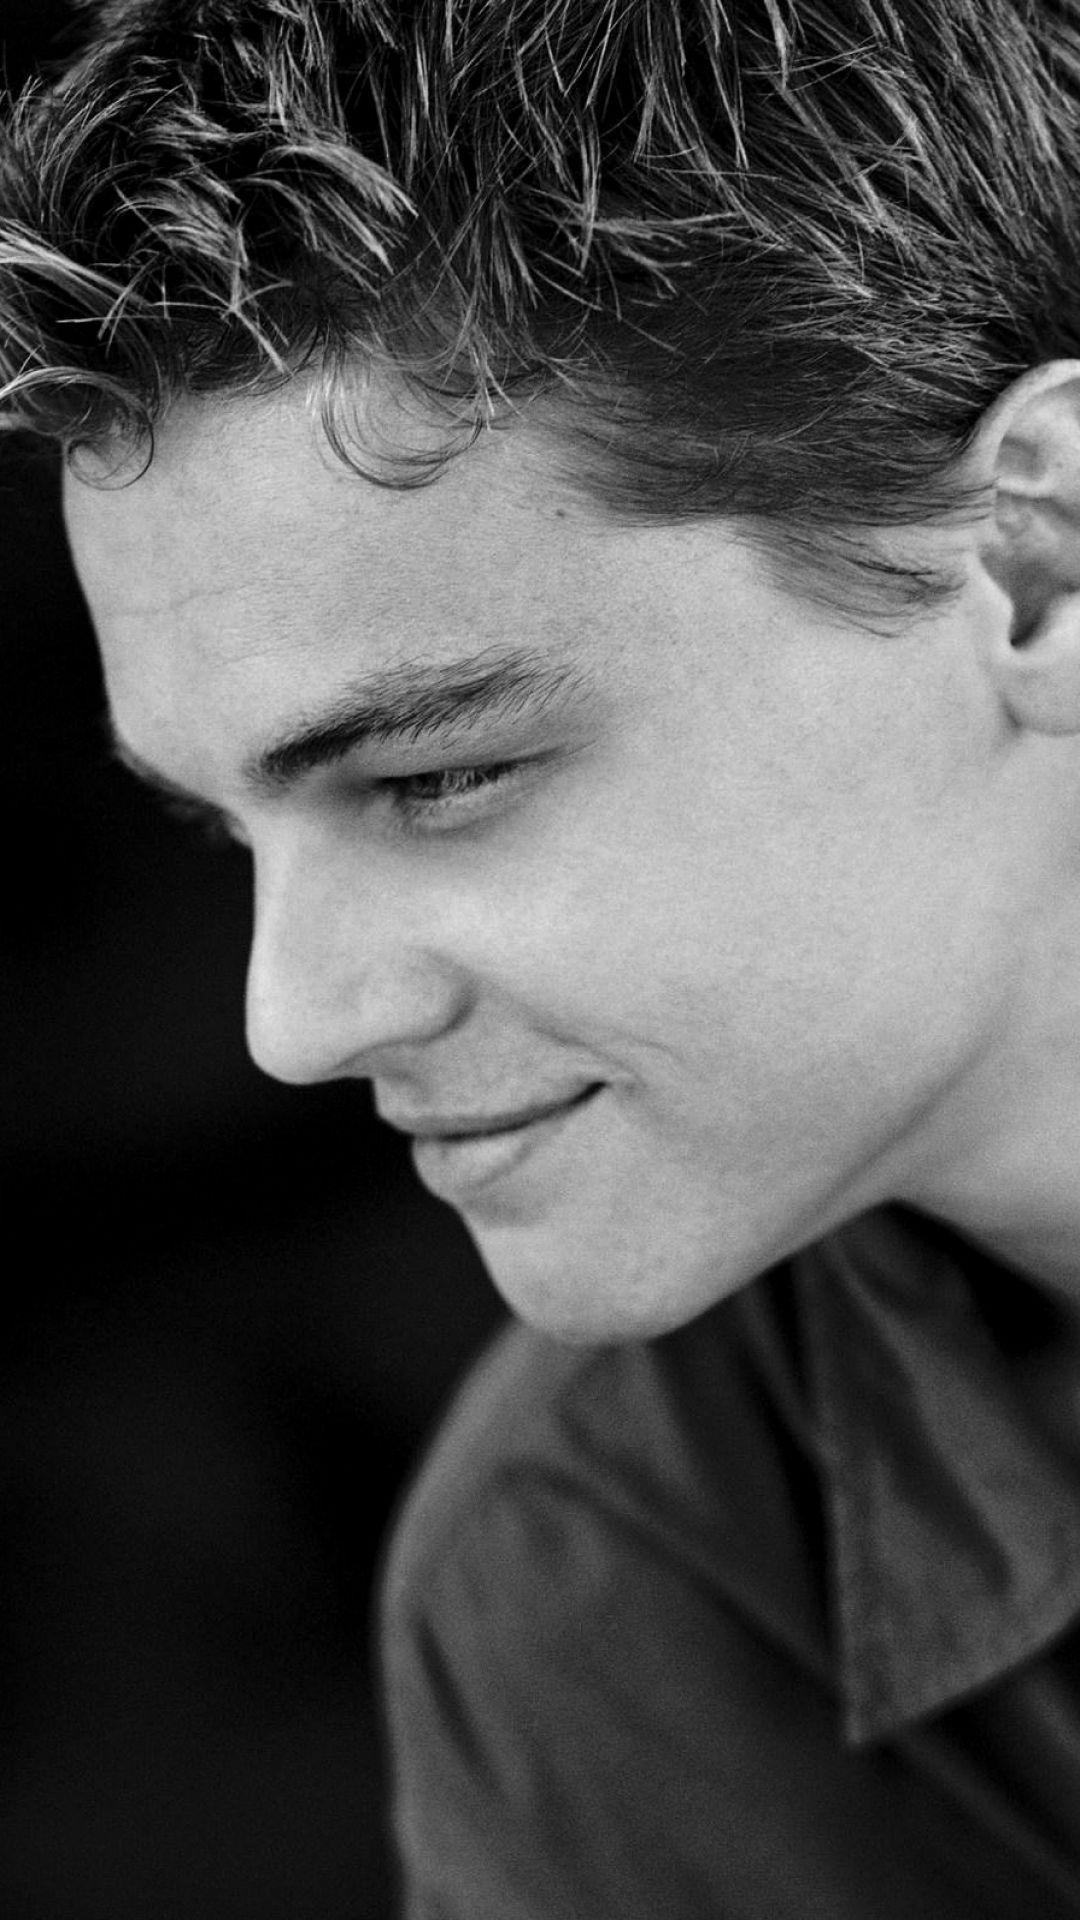 Leonardo Dicaprio Iphone Wallpapers Top Free Leonardo